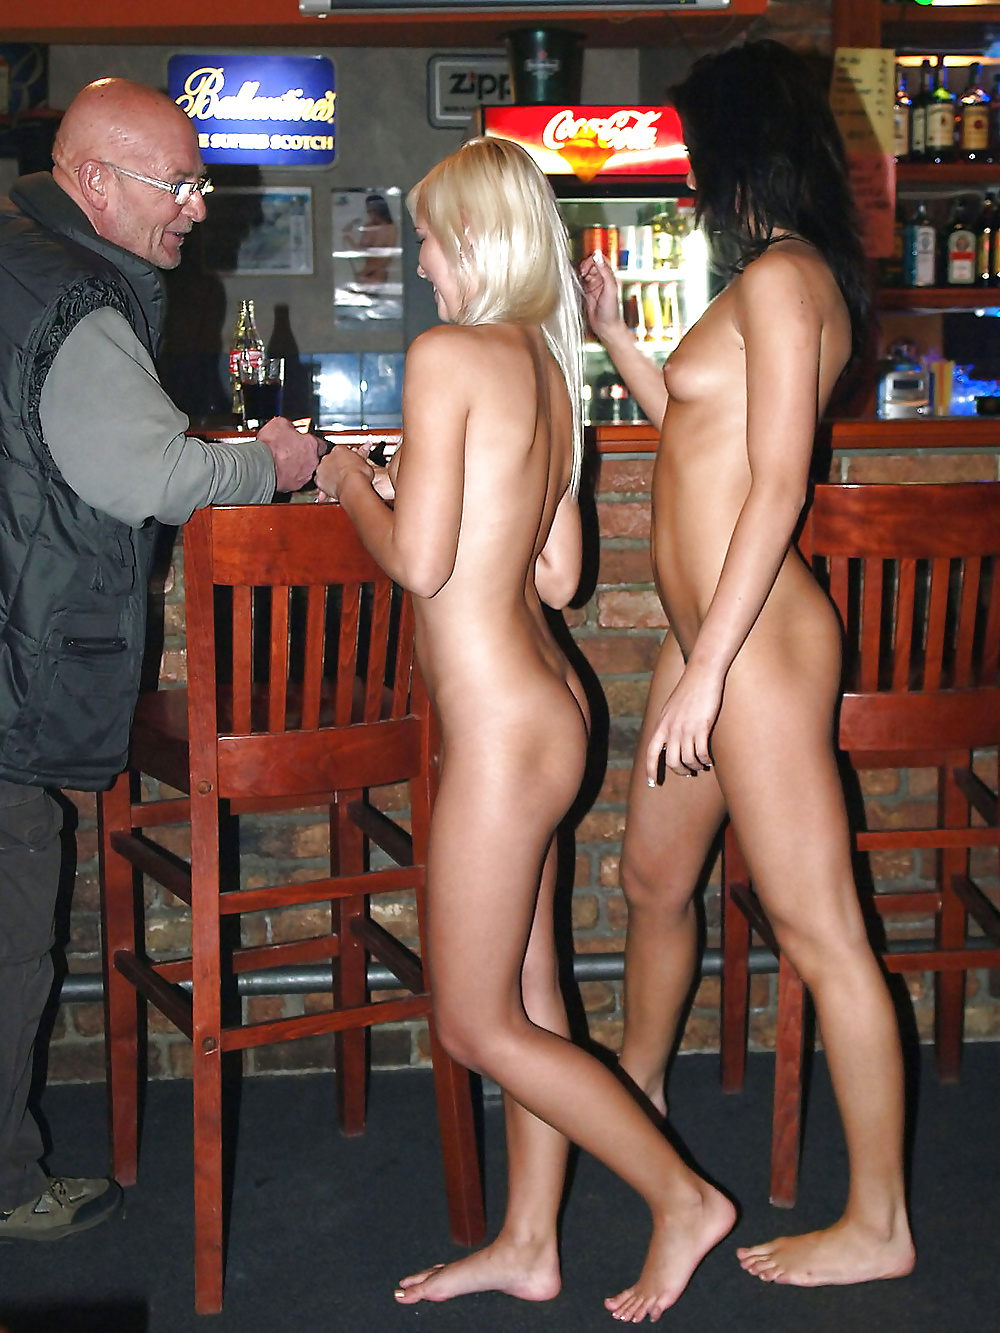 Sunset butt naked in pub